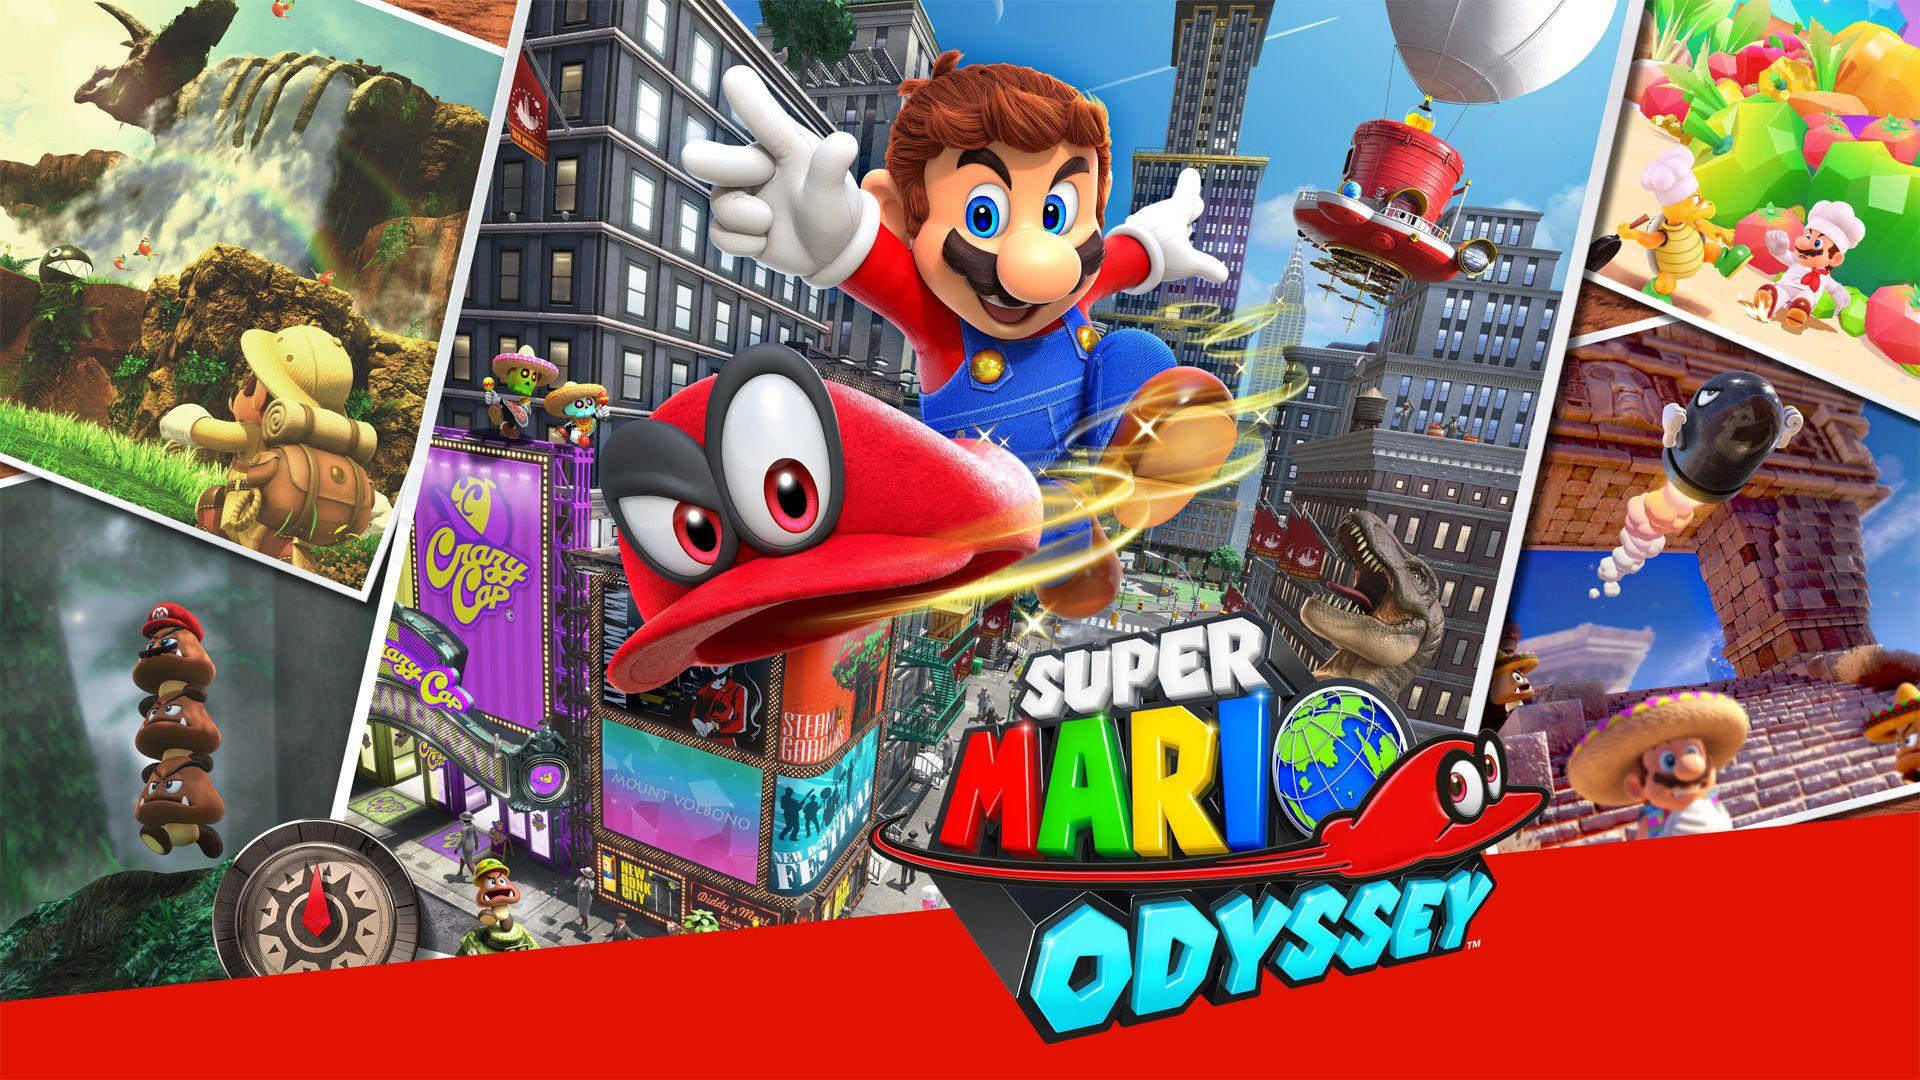 Super Mario Odyssey Refurbished (Nintendo Switch) pre-owned £29.99 @ ebay / MusicMagPie